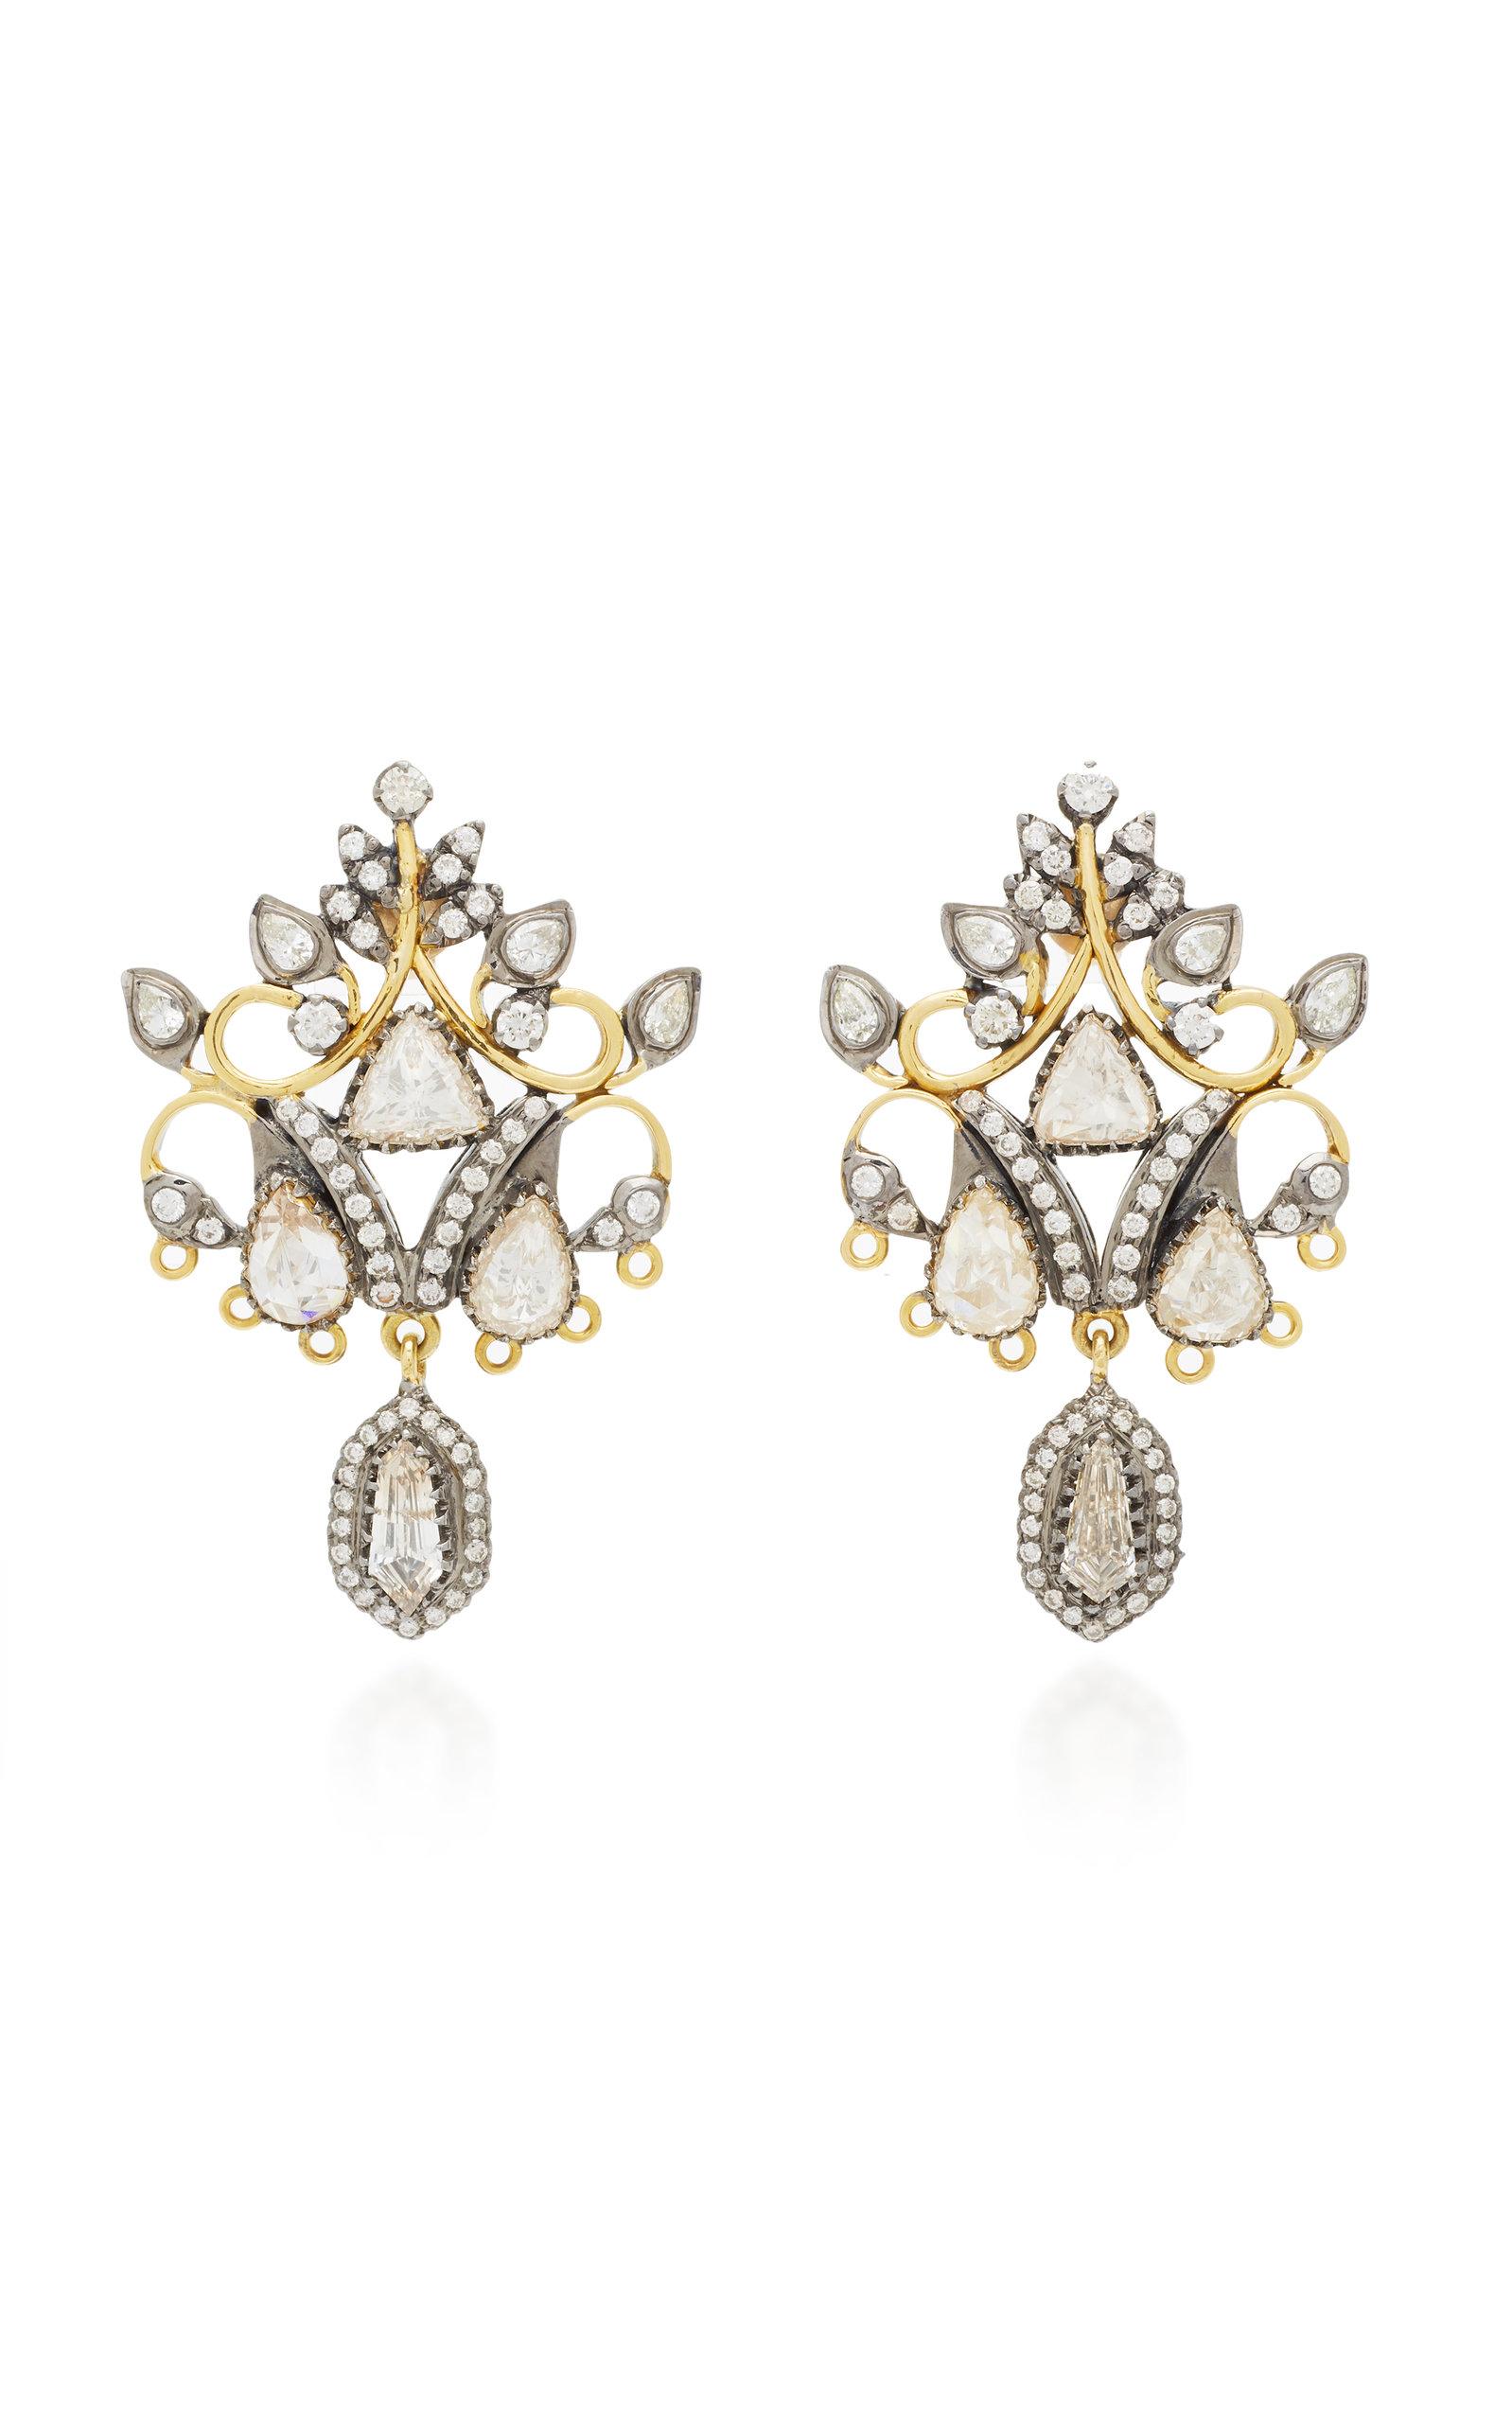 Women's 18K Black And Yellow Gold Diamond Earrings